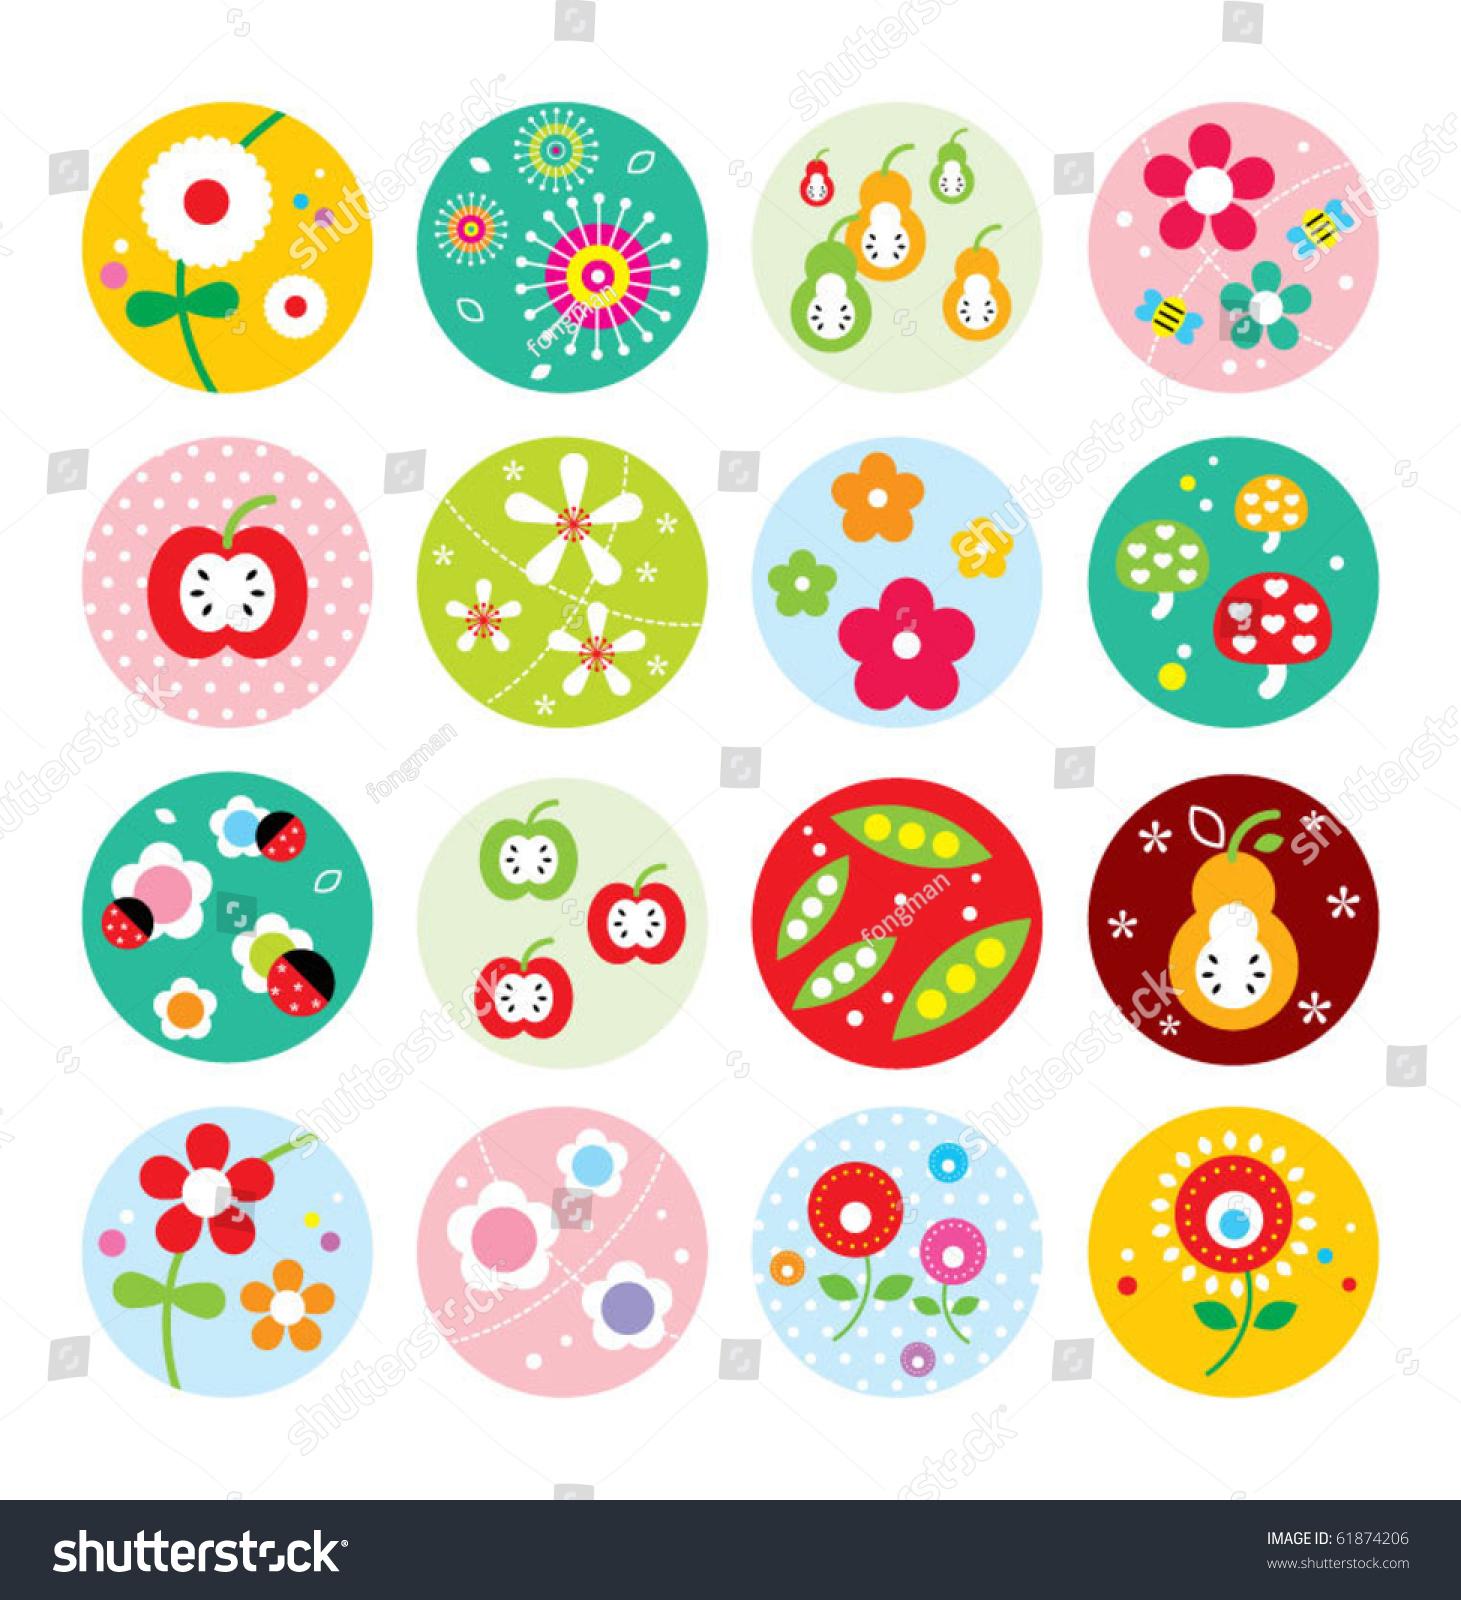 Pretty flower sticker stock vector 61874206 shutterstock pretty flower sticker dhlflorist Image collections